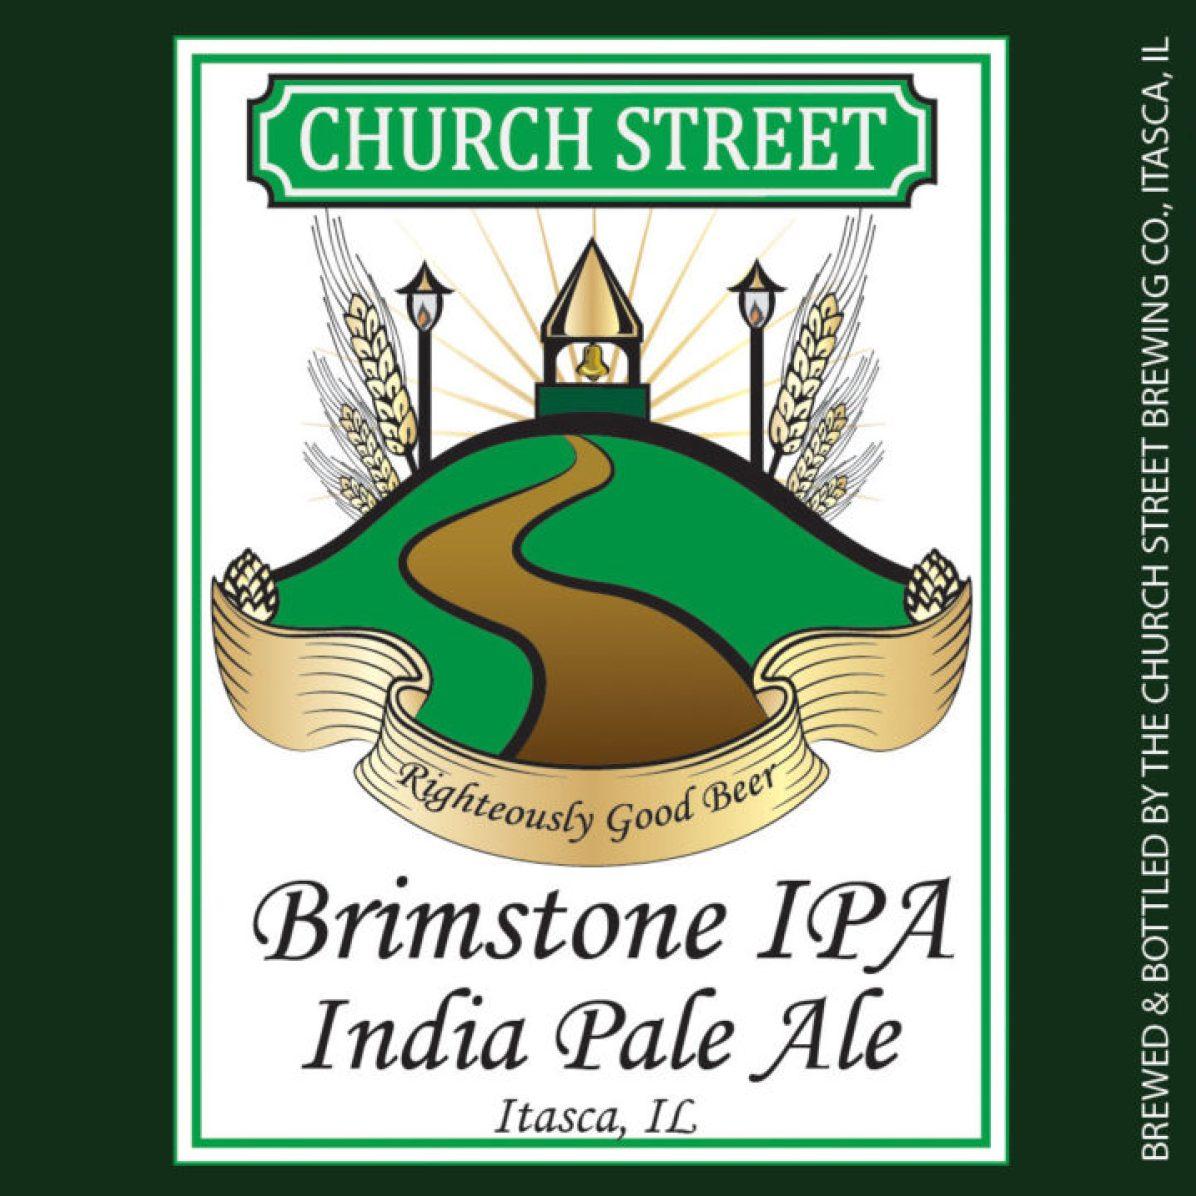 Church Street Brimstone IPA